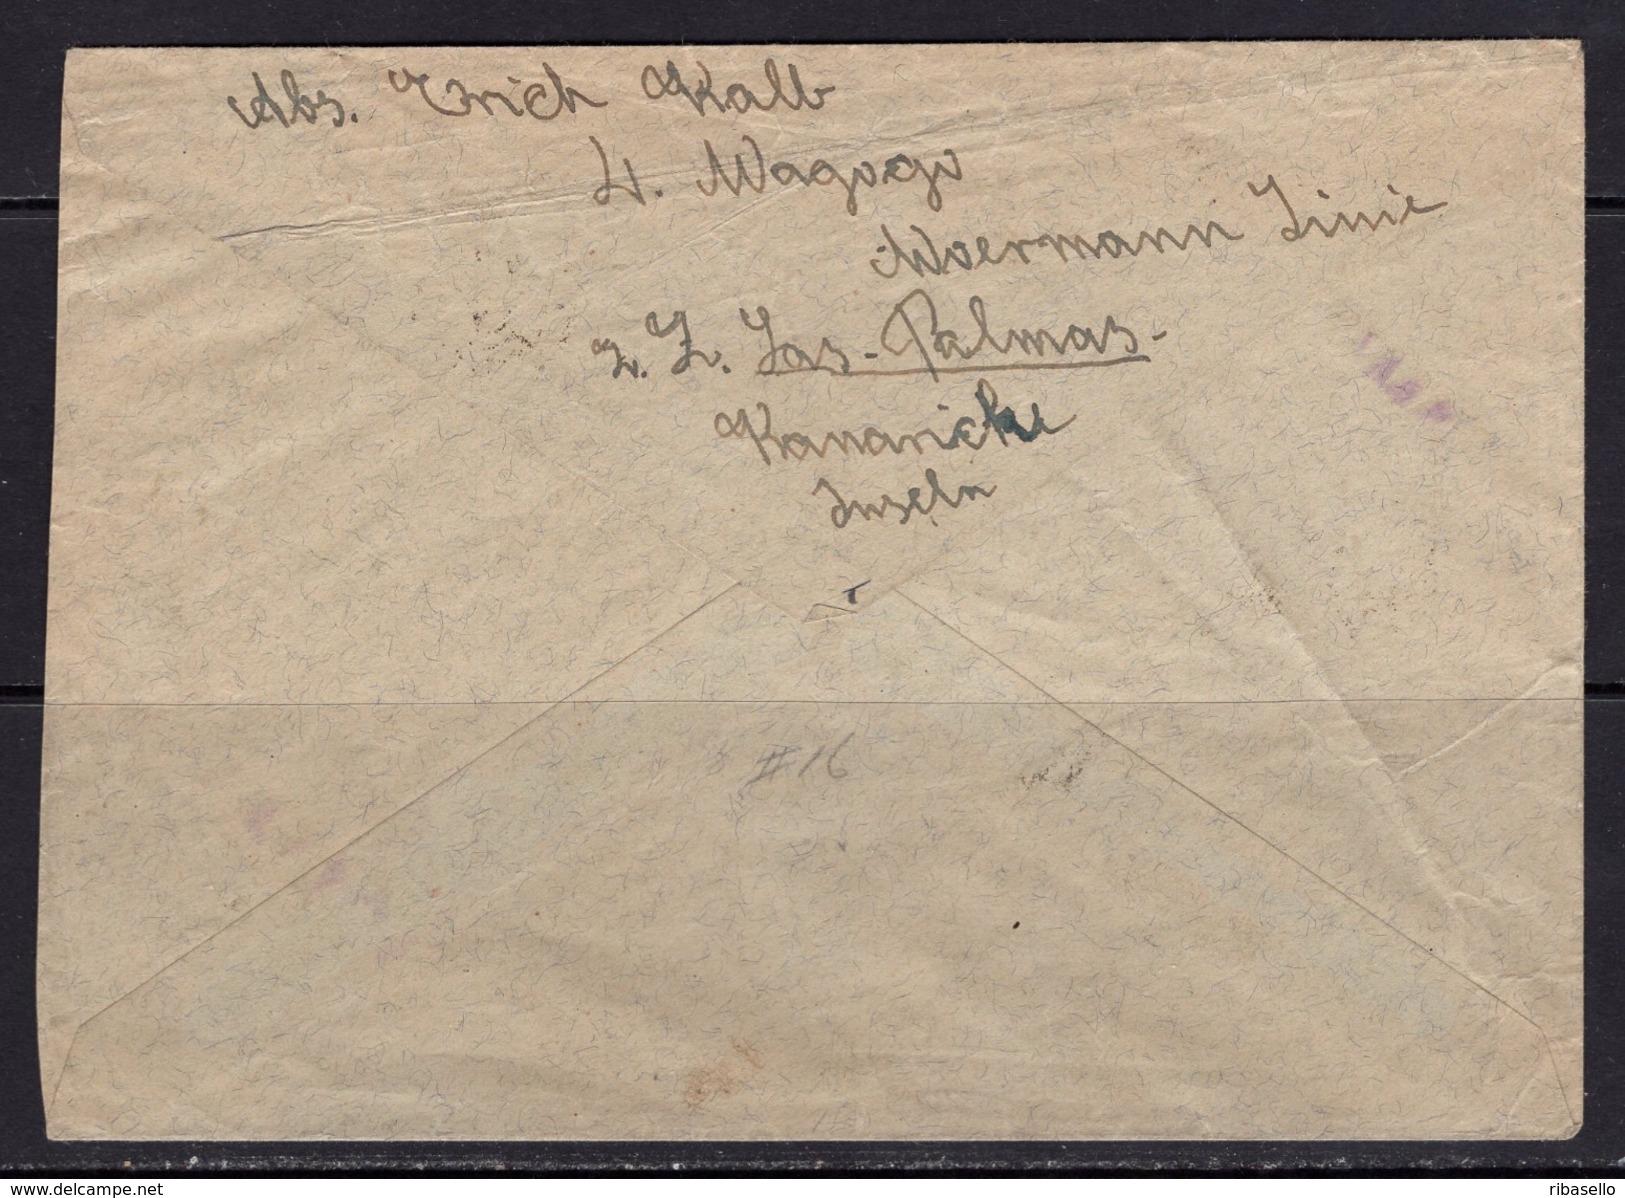 España 1937. Canarias. Carta De Tenerife A Mittweida. Censura. - Marcas De Censura Nacional